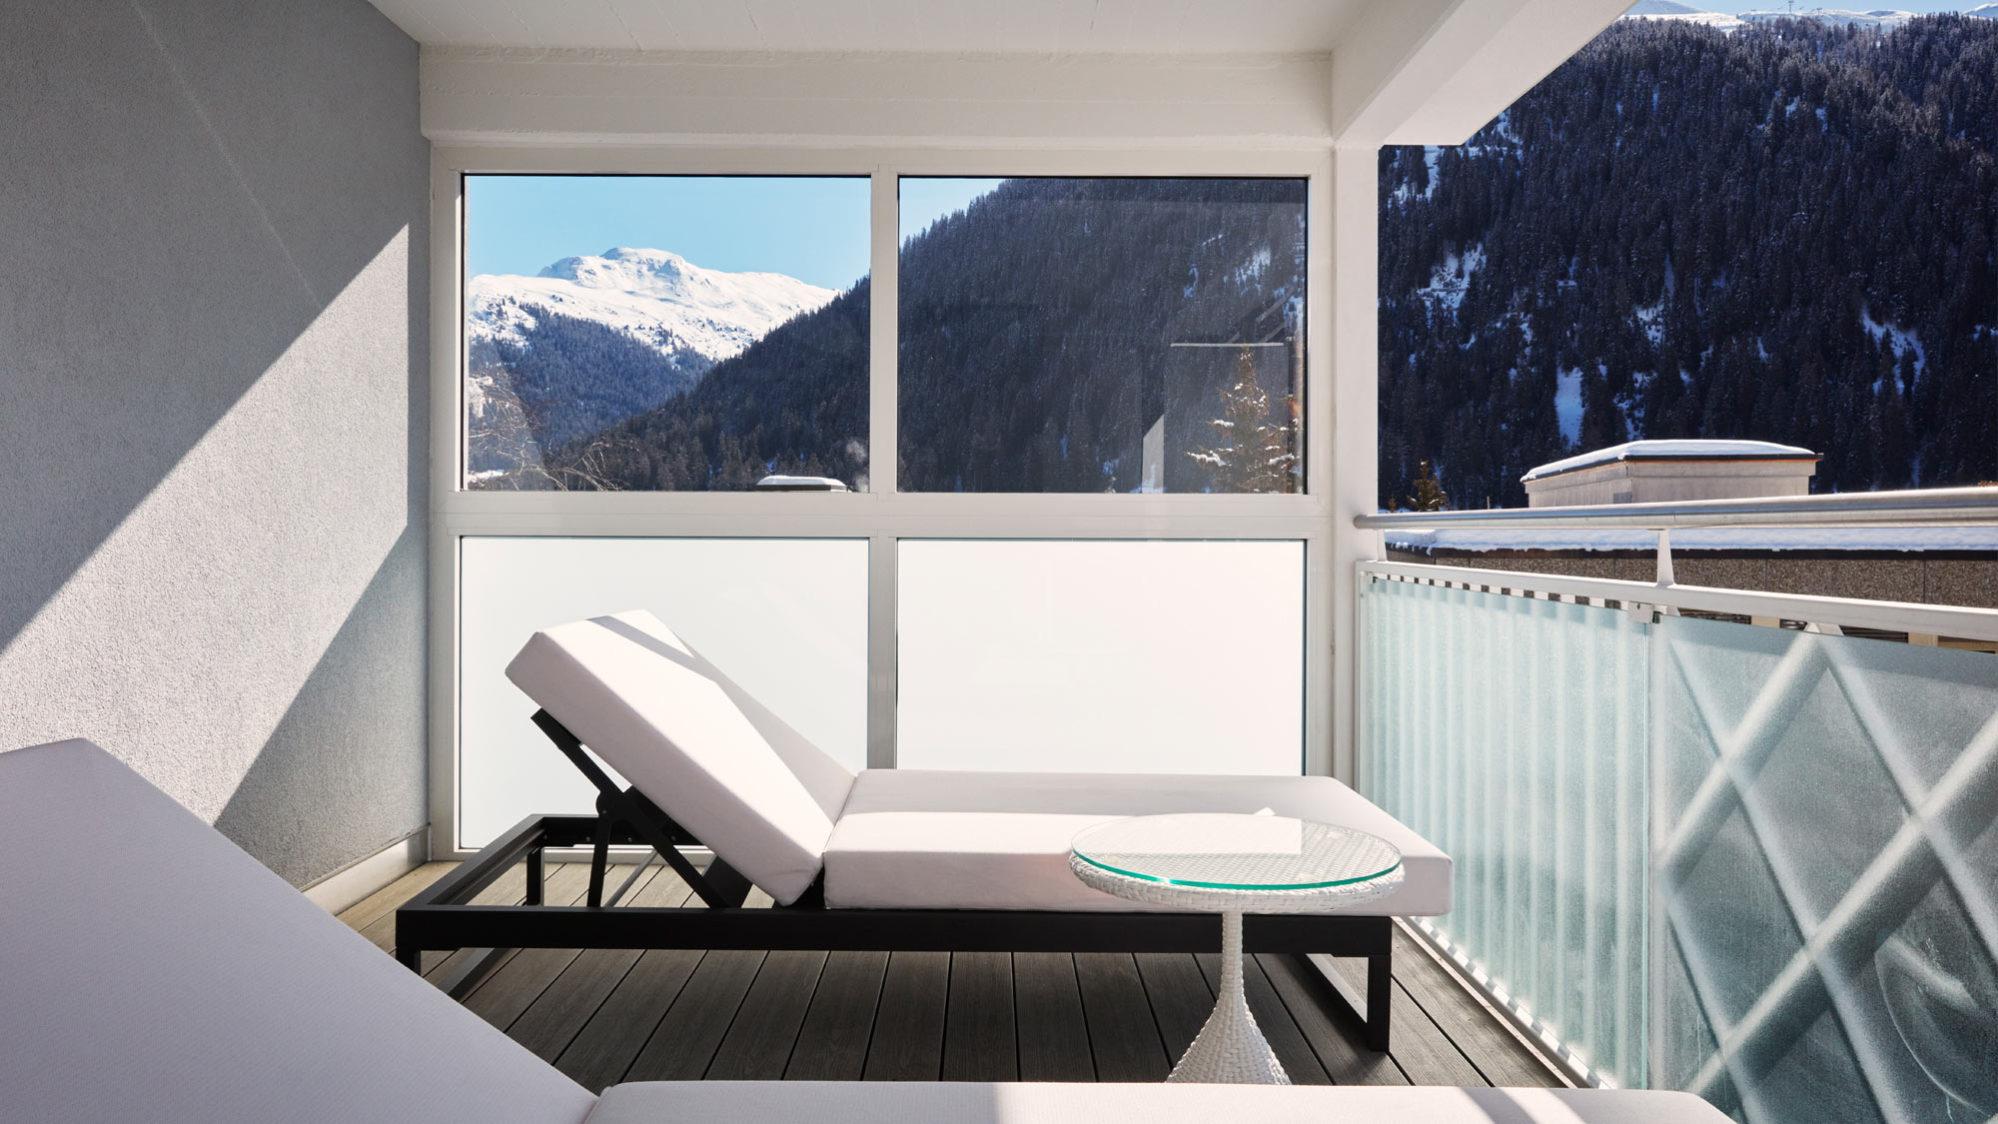 Ferienwohnung Schweiz 2O4A4045_site_ed-1-e1498736250192